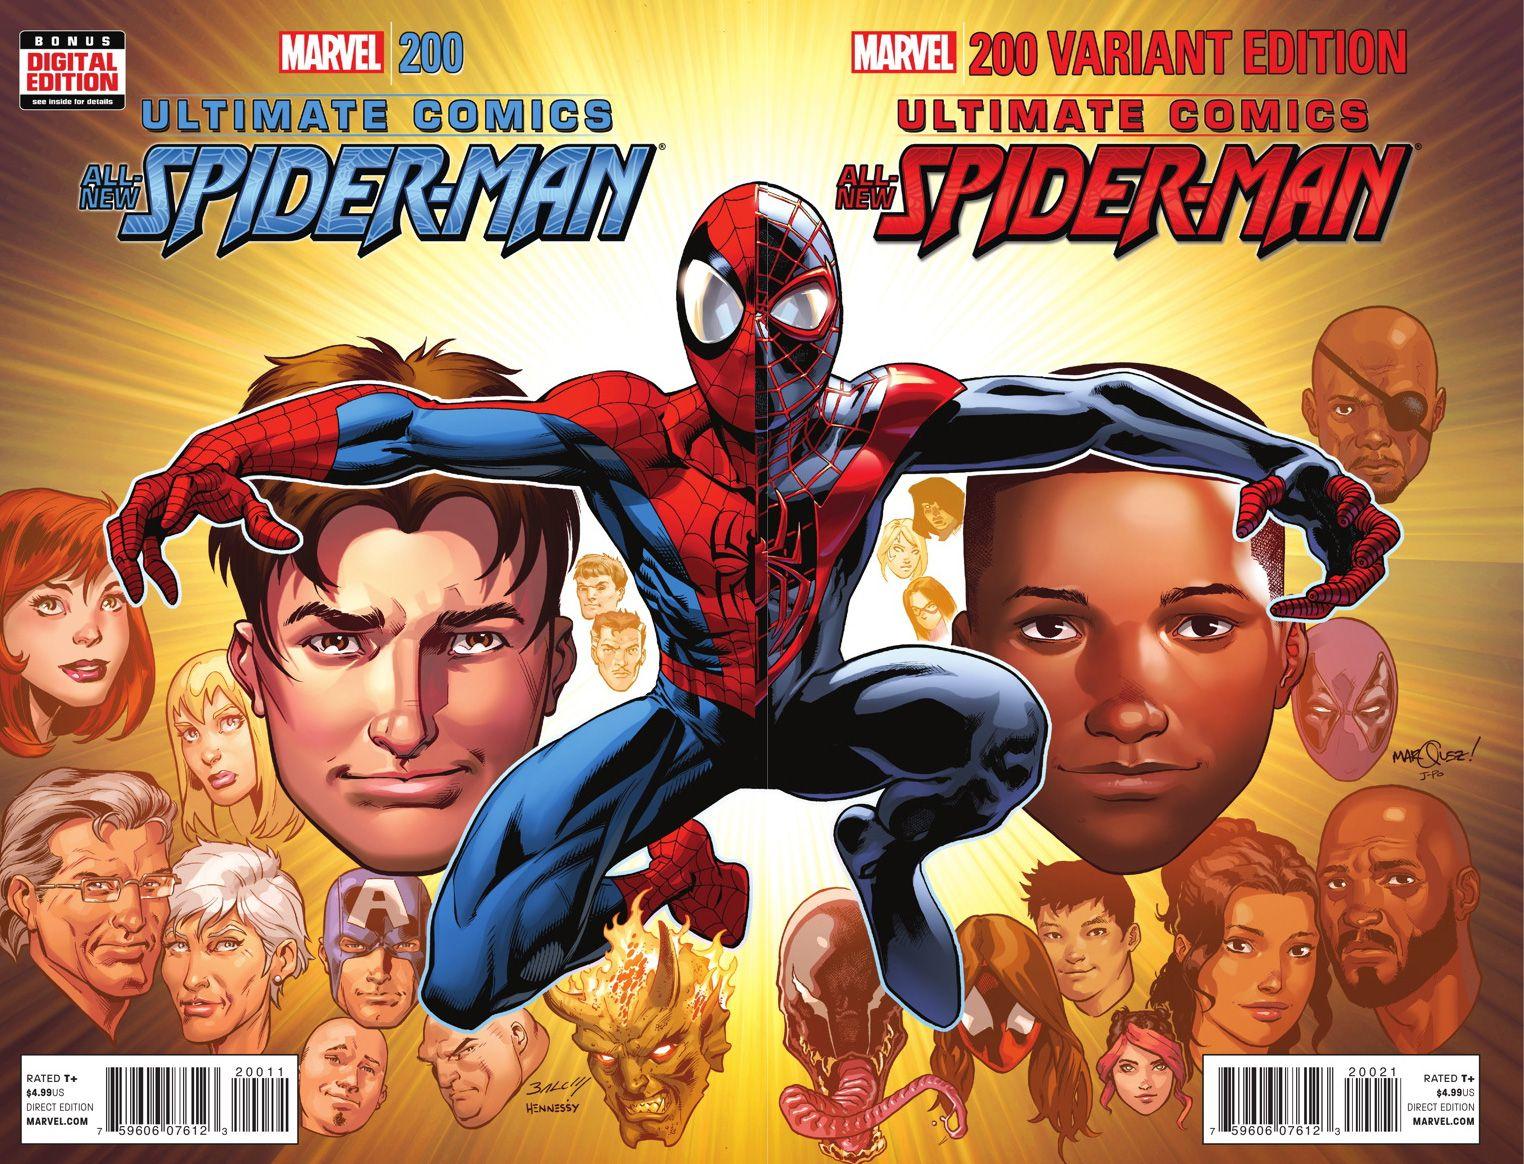 Ultimate Comics: Spider-Man #200